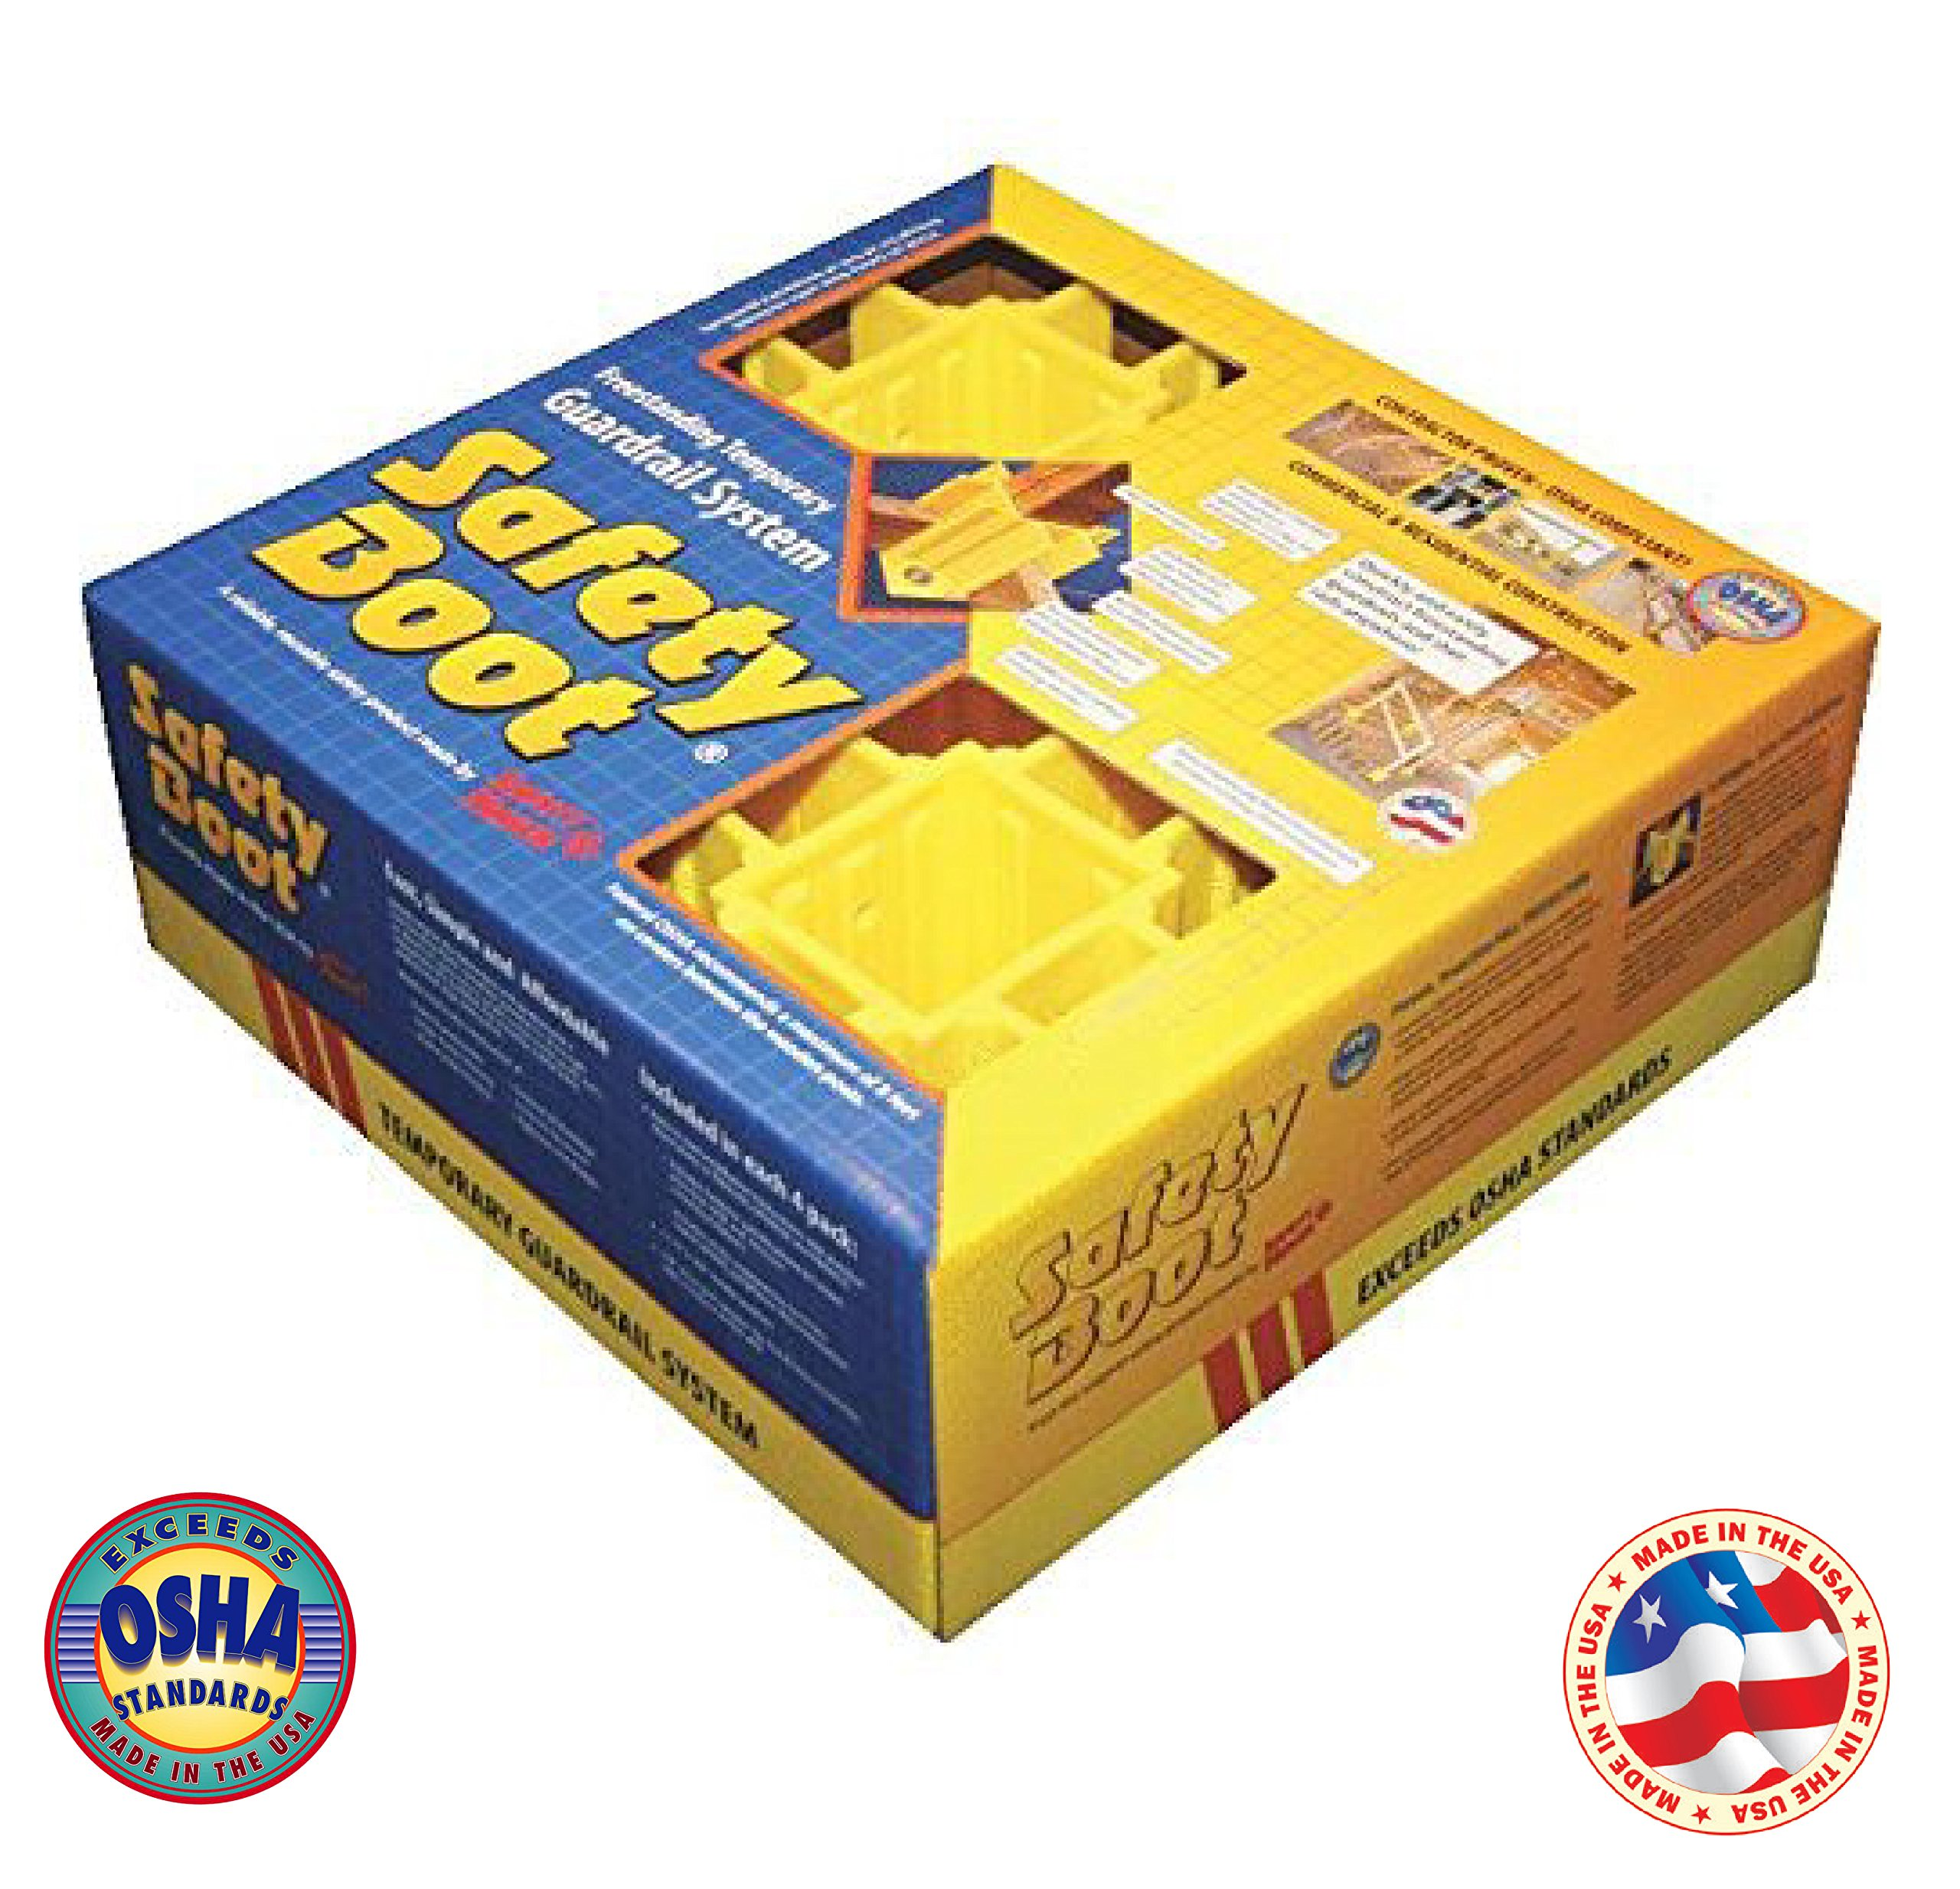 Safety Boot Yellow OSHA Temporary Guard Rail System by Safety Maker (12 Units) by Safety Maker, Inc. (Image #8)